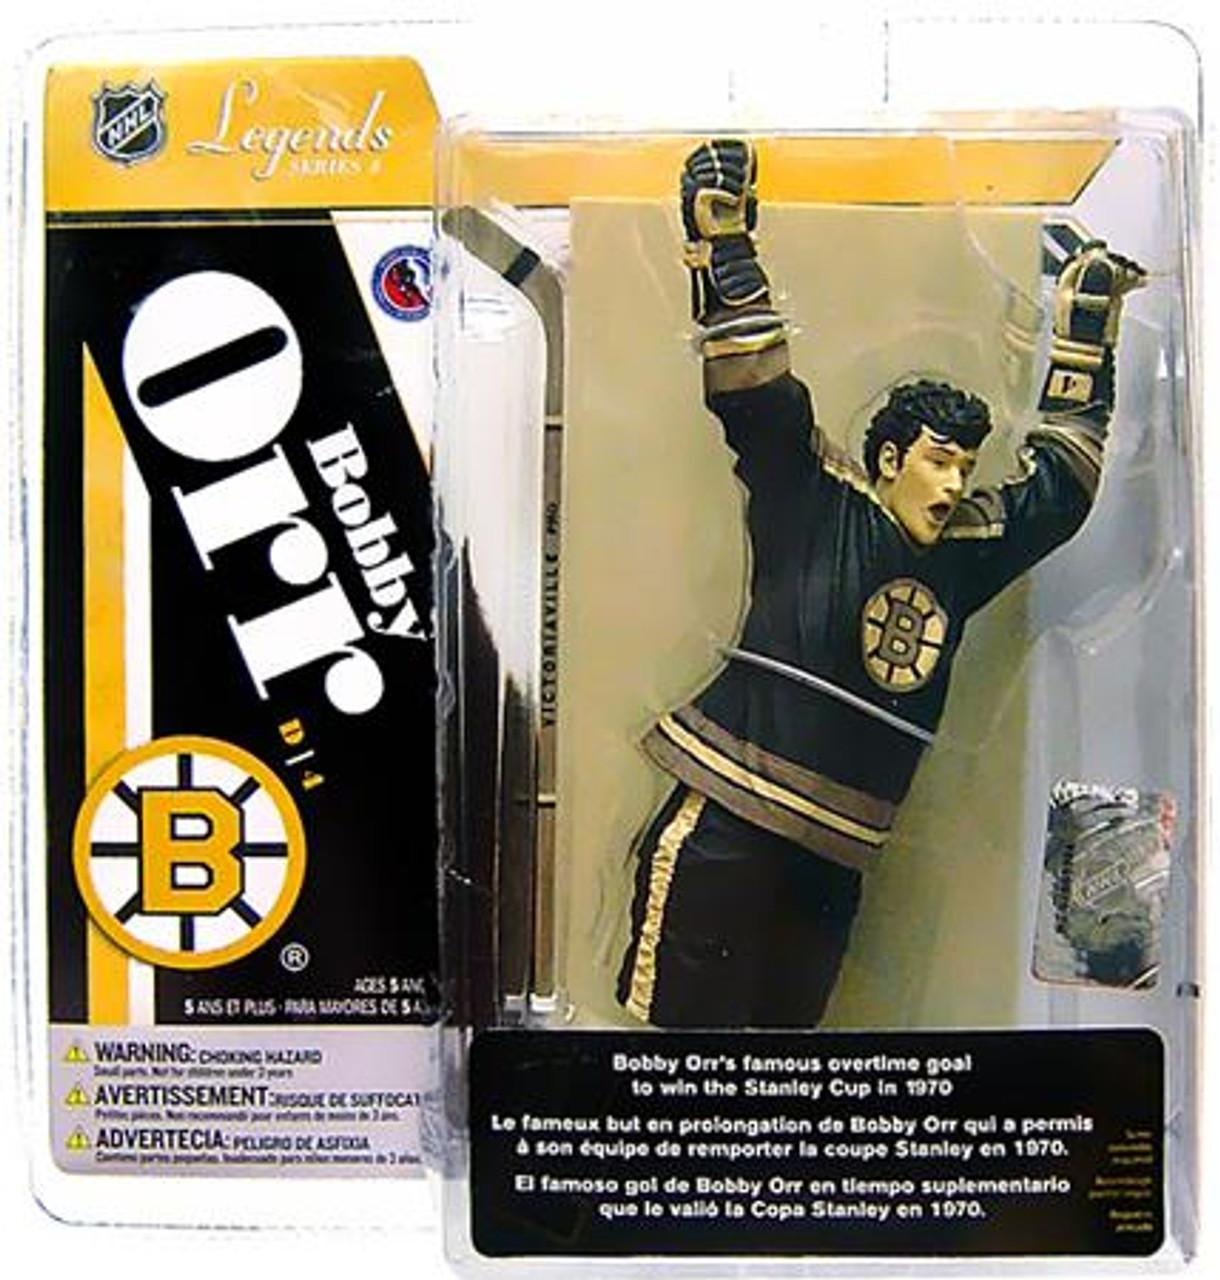 McFarlane Toys NHL Boston Bruins Sports Picks Legends Series 4 Bobby Orr Action Figure [Sepia Color Variant]